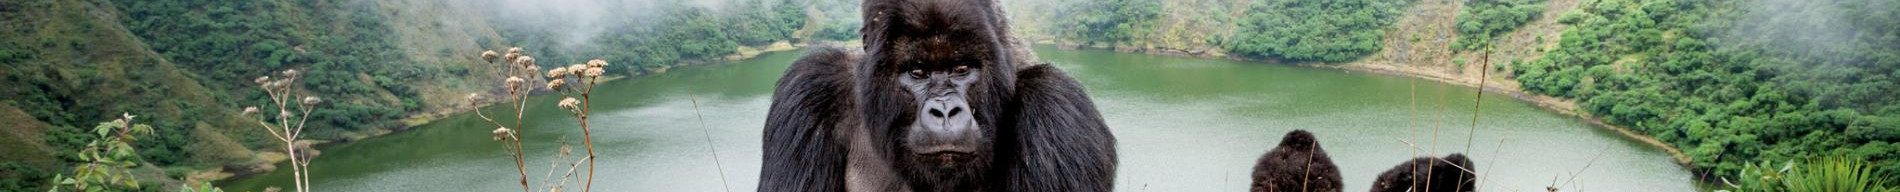 9 Days, Gorillas & Beyond.jpg